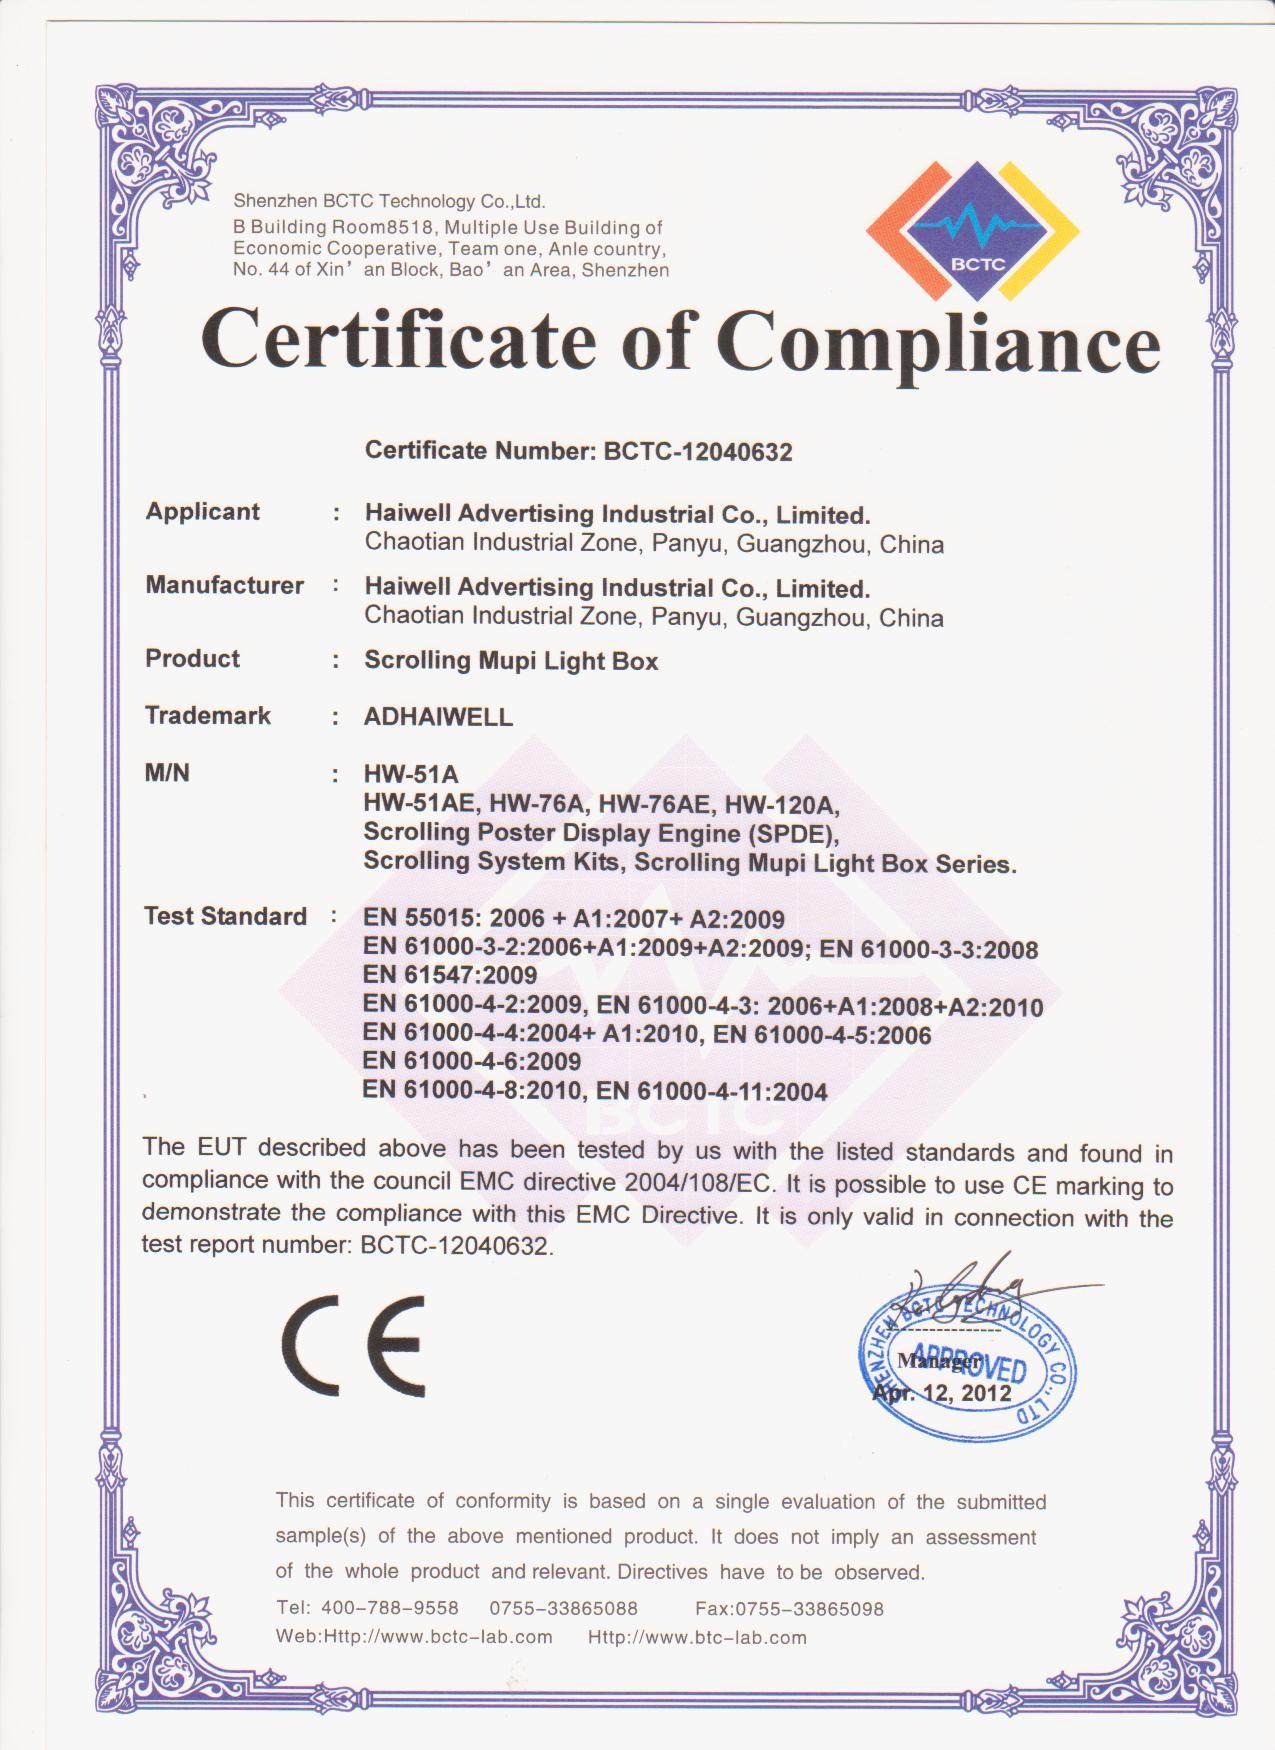 General Sample Of Cv – Conformity Certificate Template